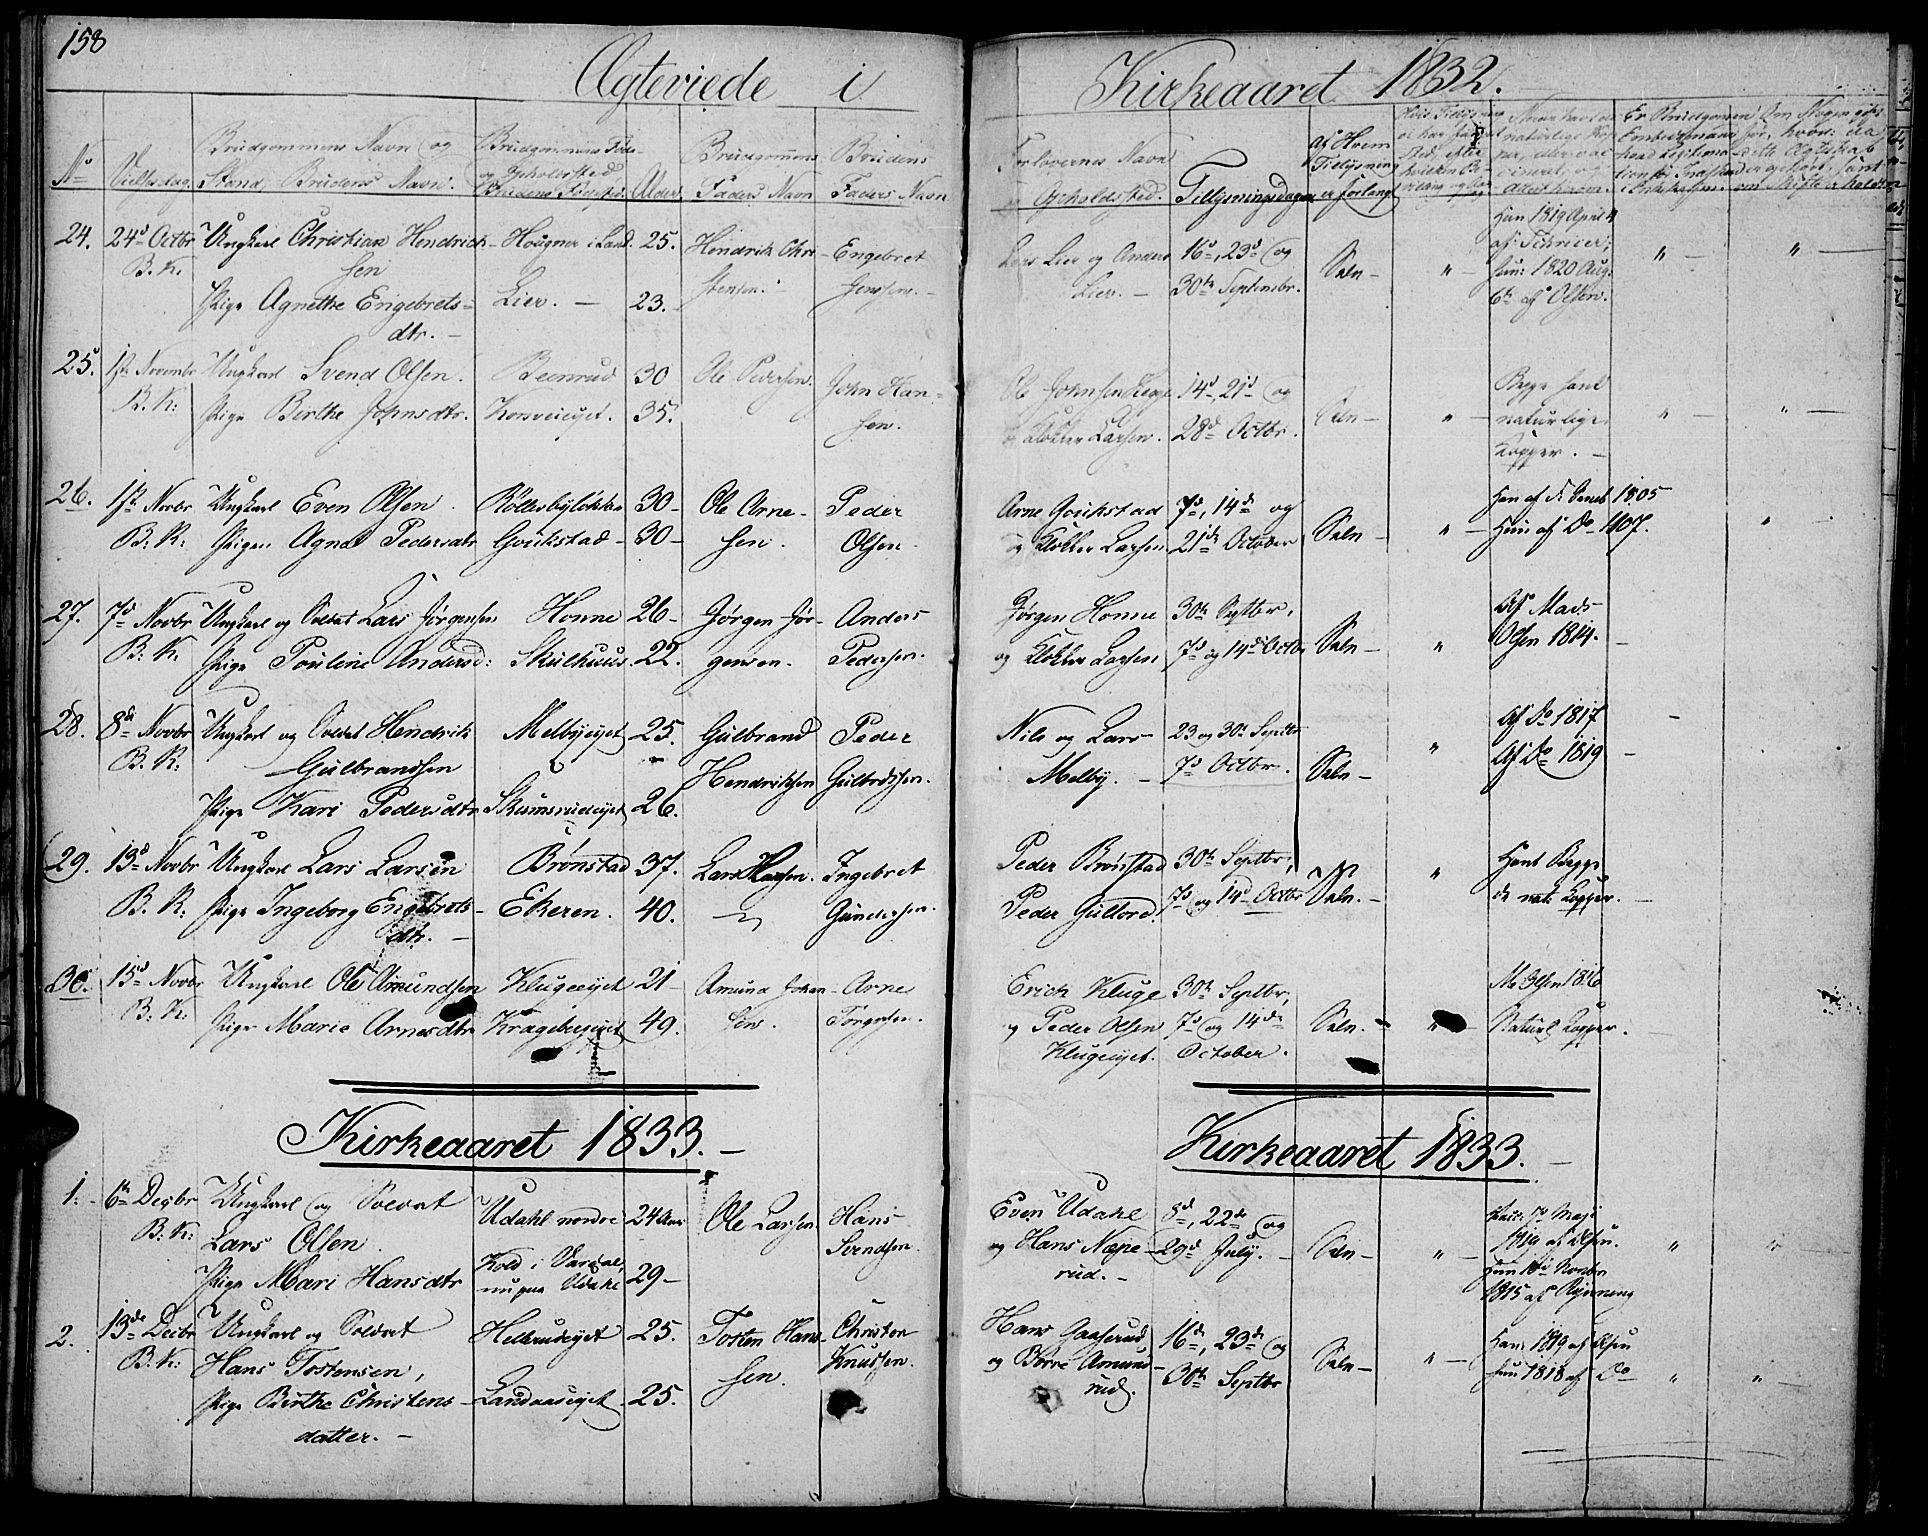 SAH, Biri prestekontor, Ministerialbok nr. 4, 1829-1842, s. 158